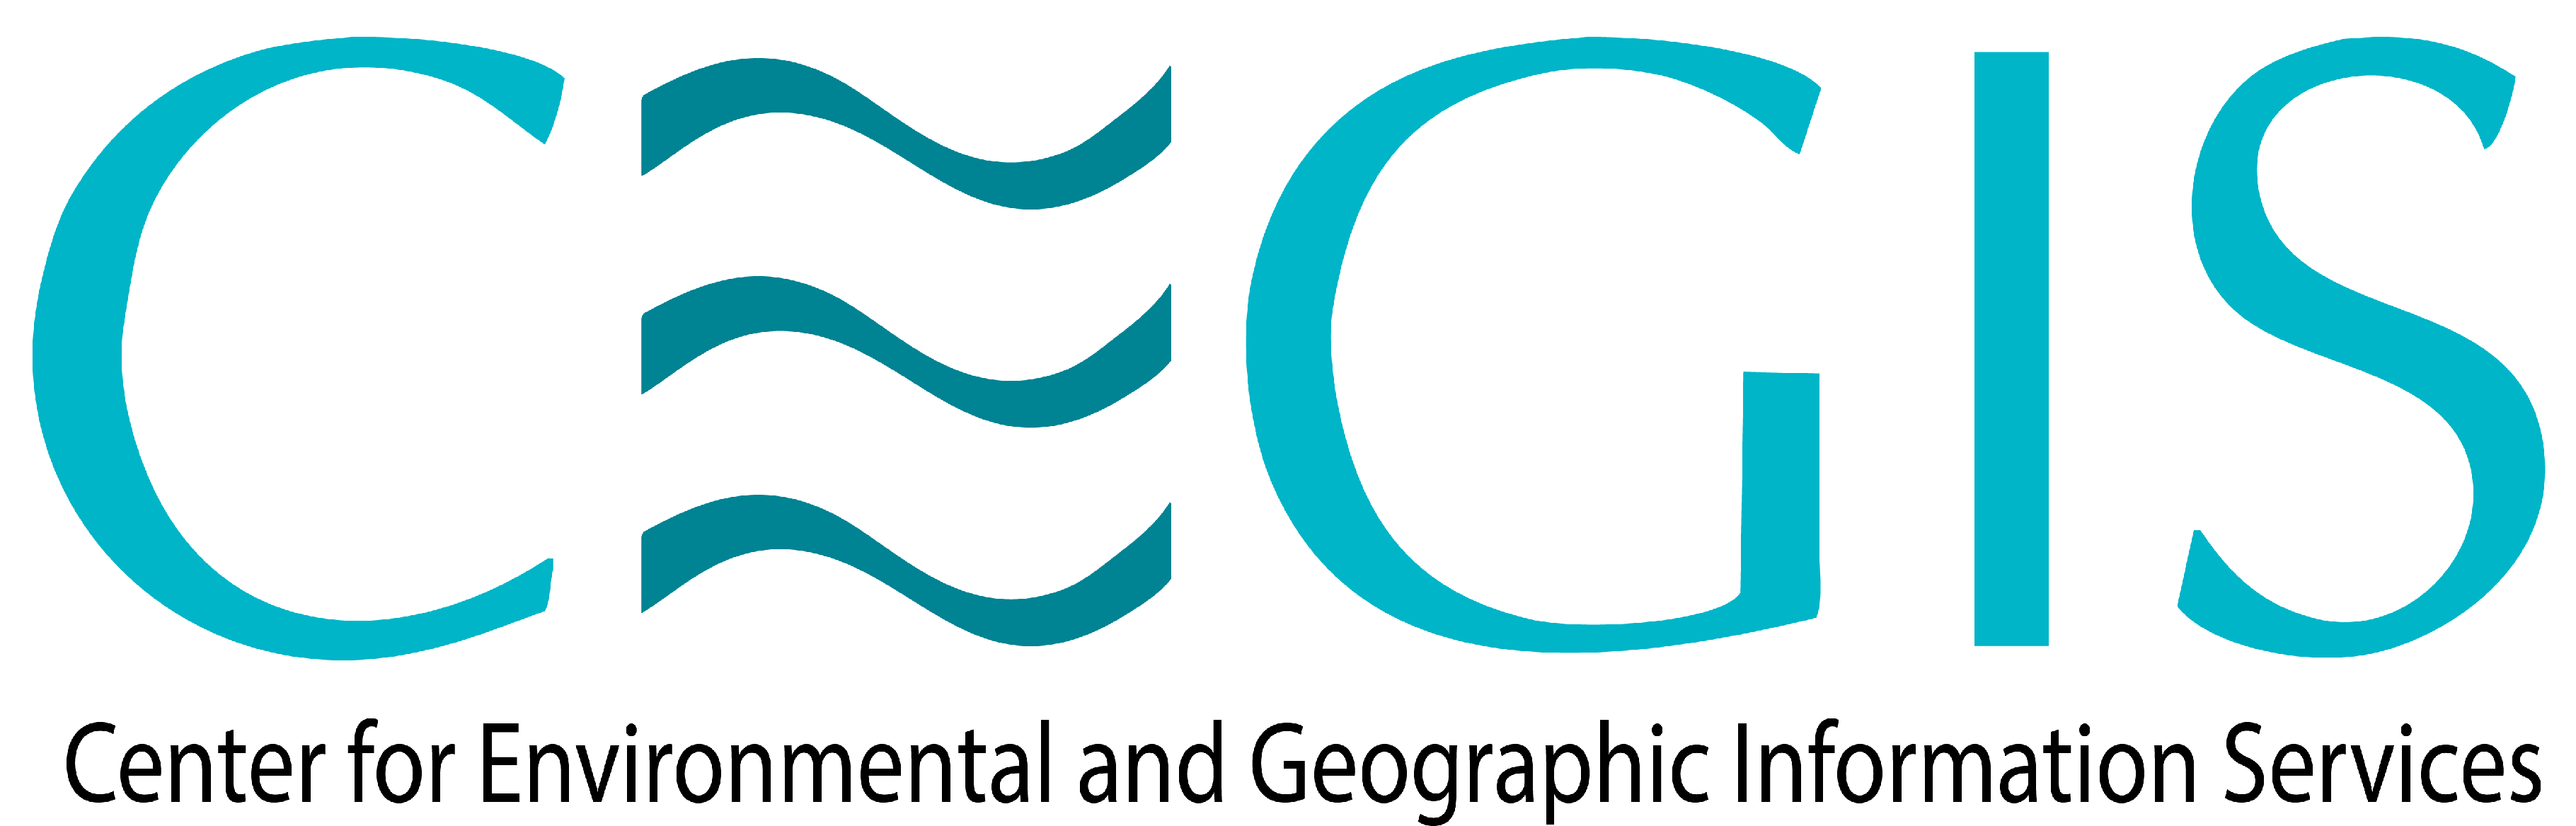 CEGIS_Logo_New